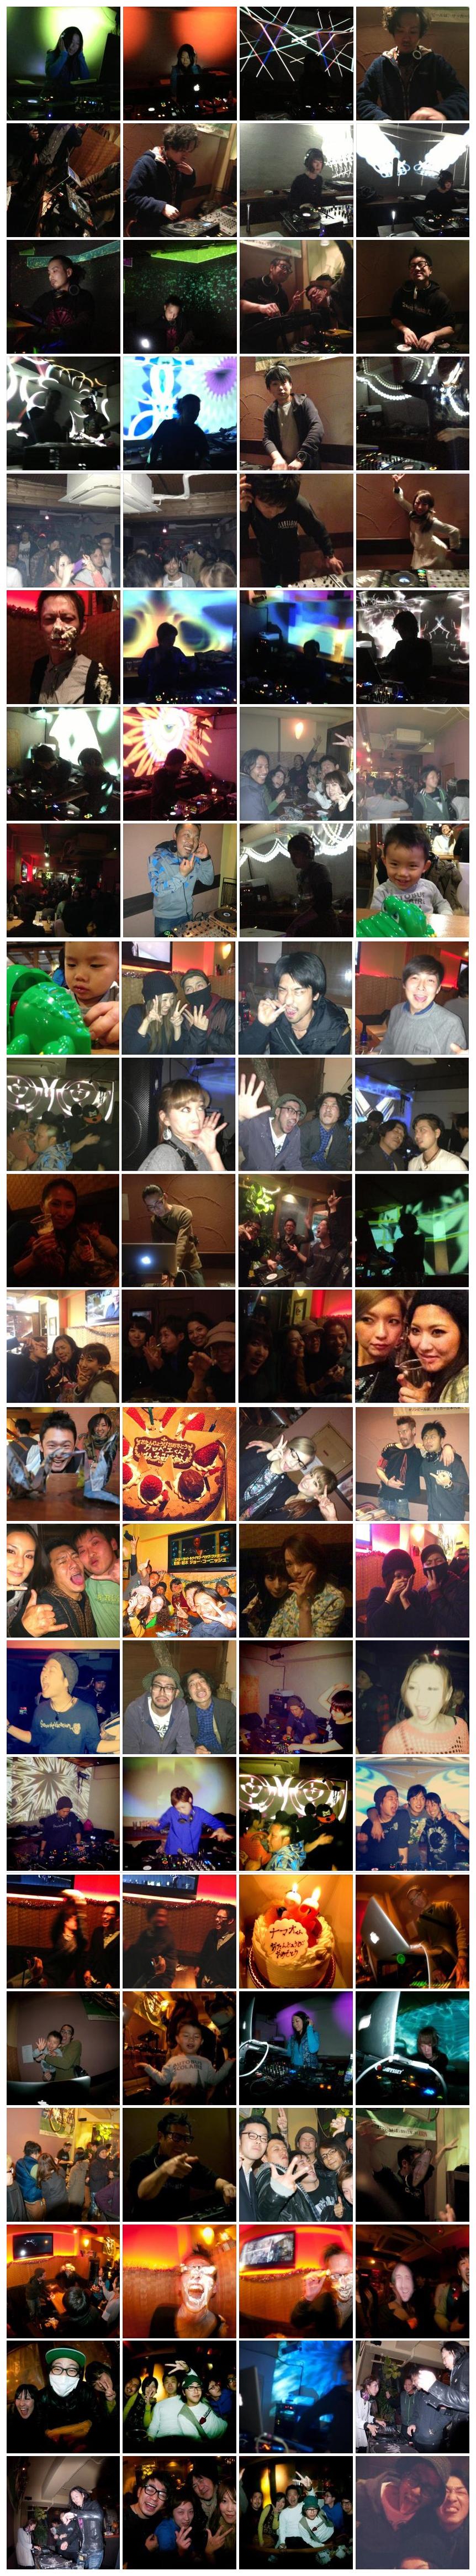 Clear_14_zing_osaka_party_photo